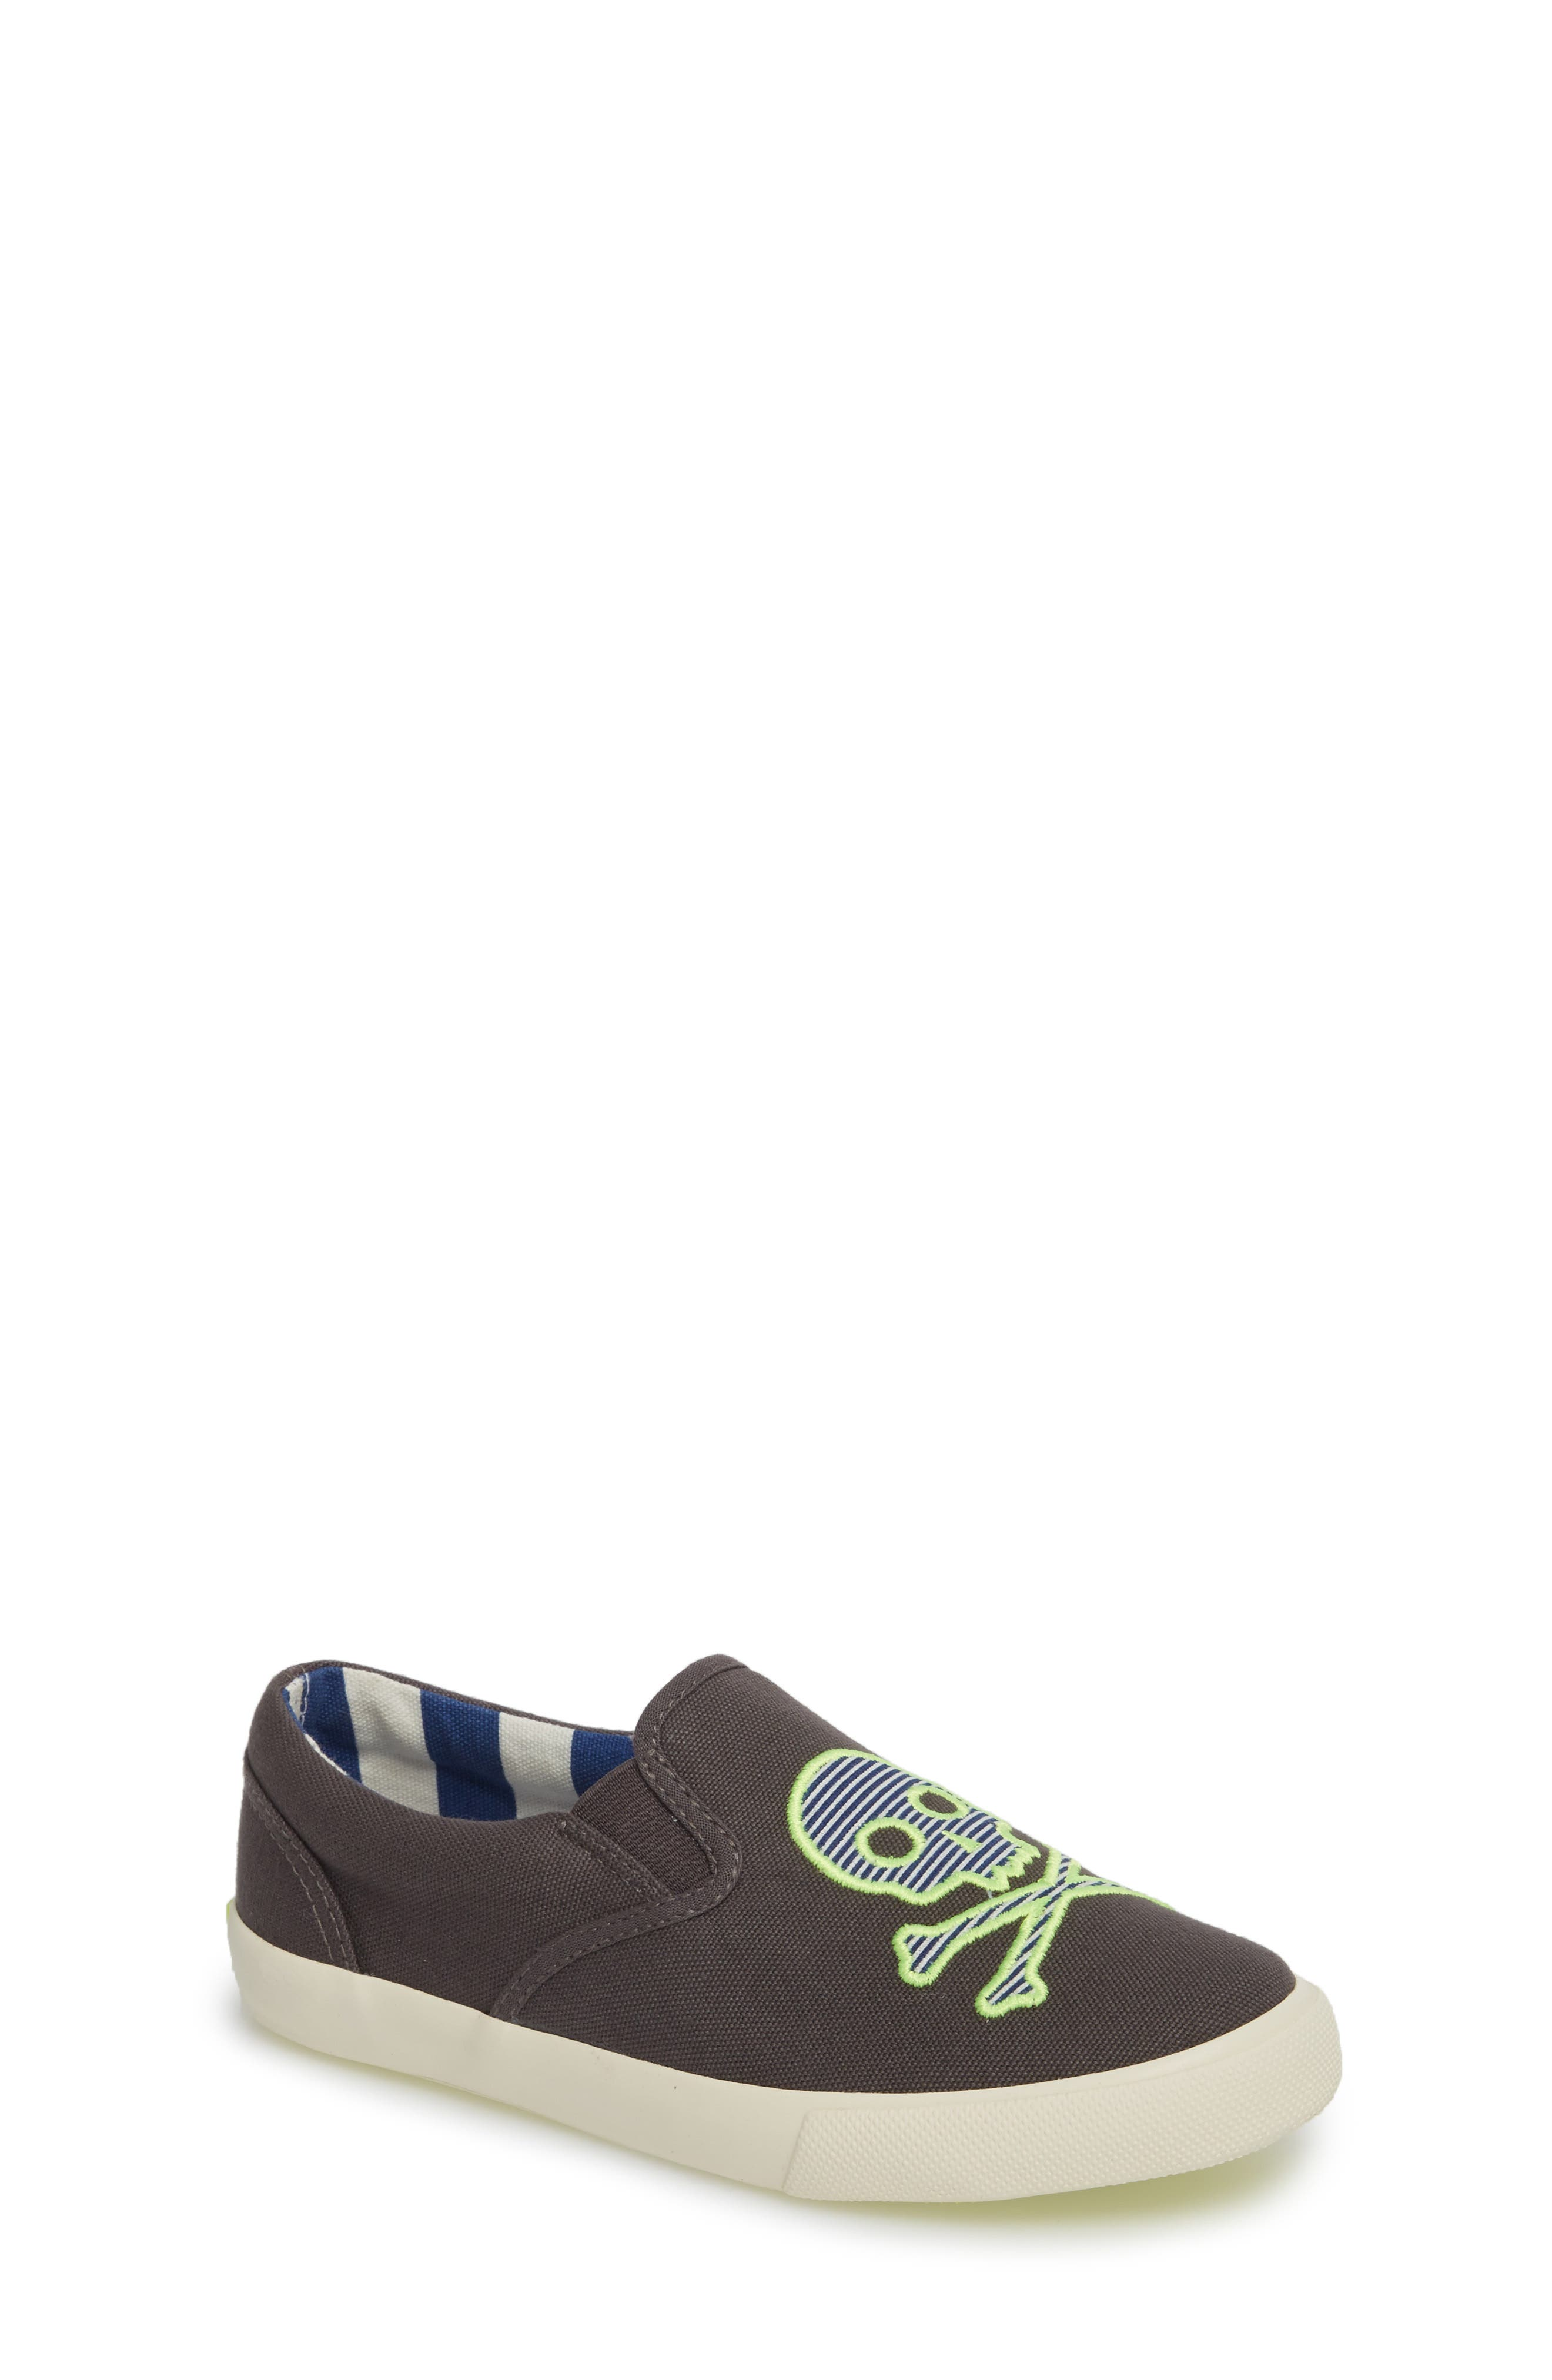 Embroidered Slip-On Sneaker,                         Main,                         color, SHARK GREY